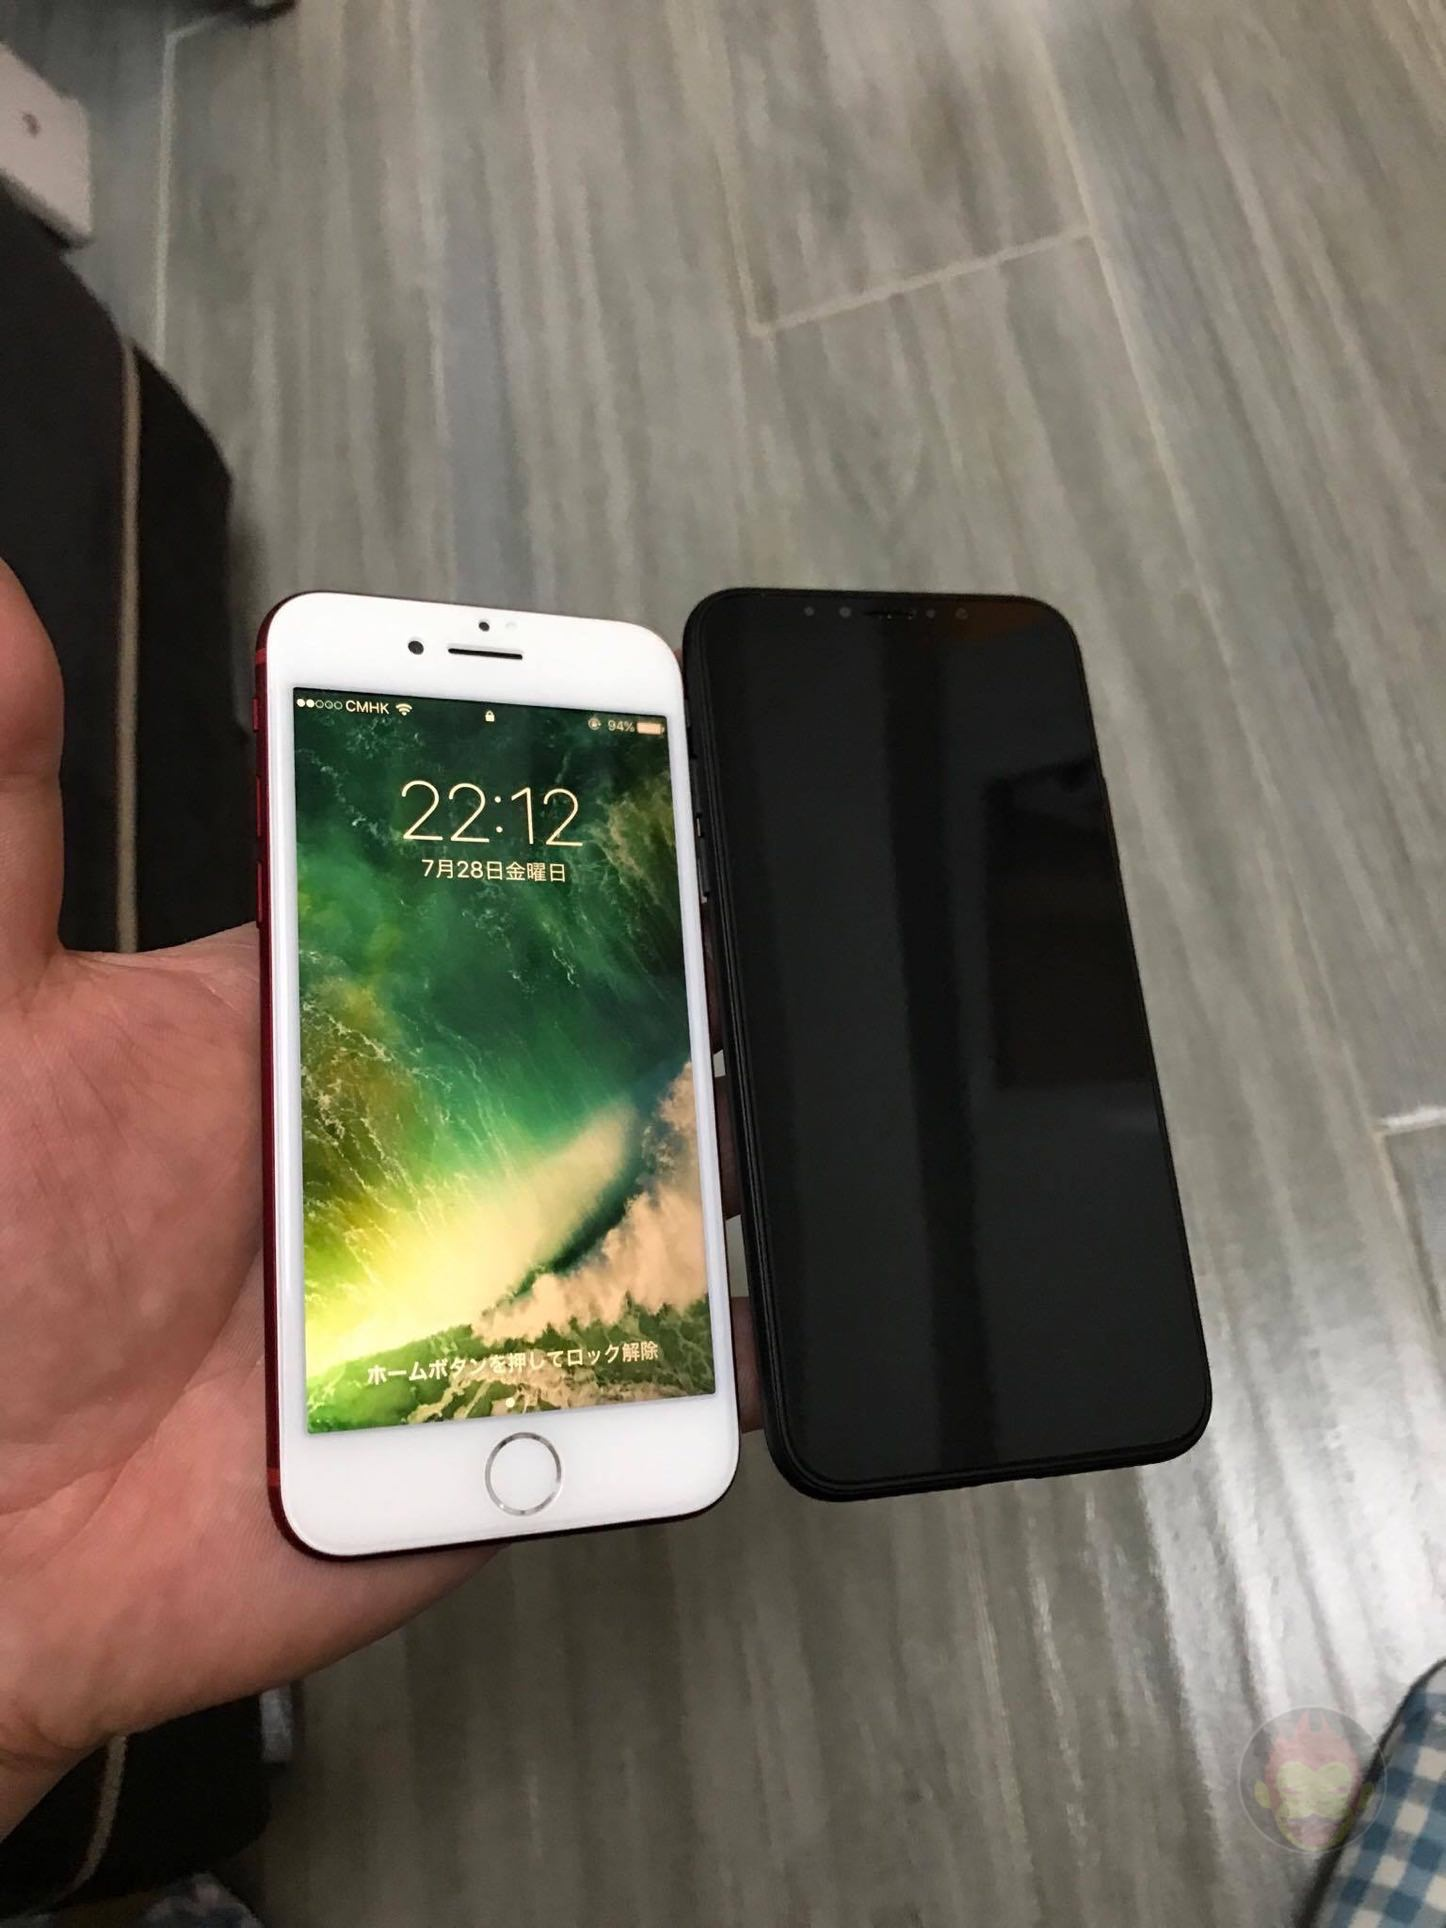 iPhone-Pro-8-Edition-Mockup-GoriMe-04.jpg